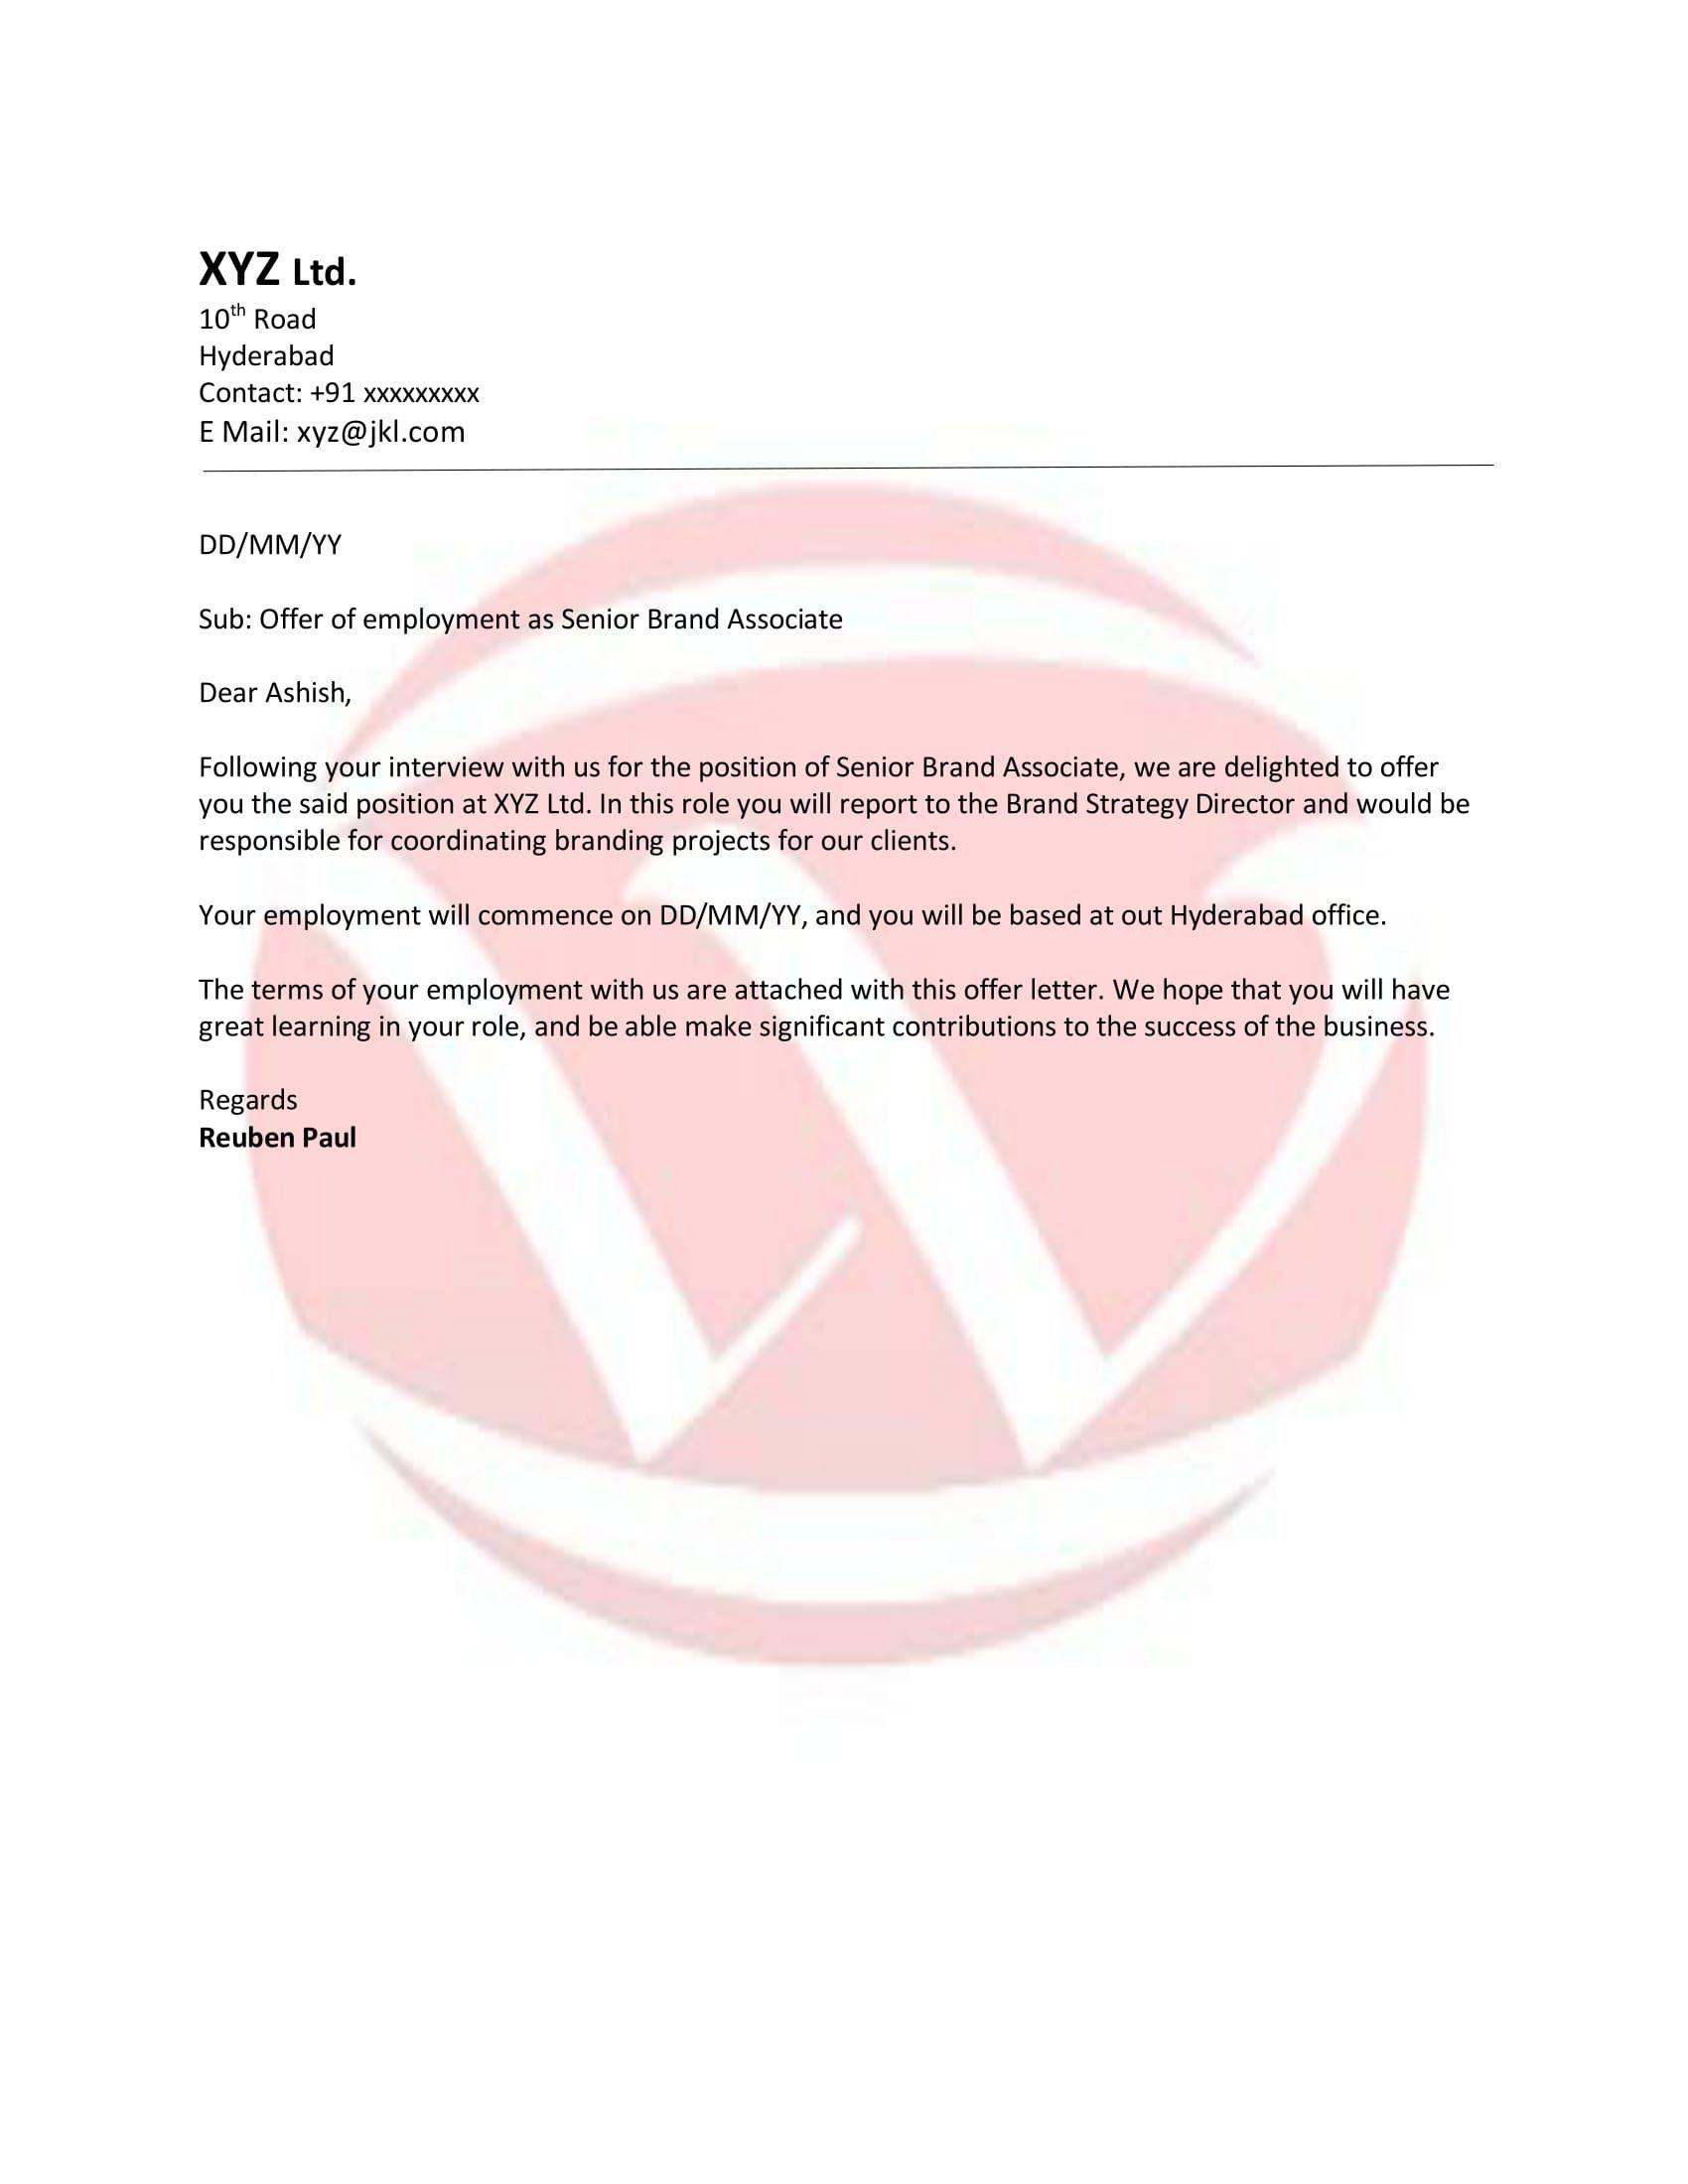 Doc Offer Letter Template Free Word Pdf Sample Format Download